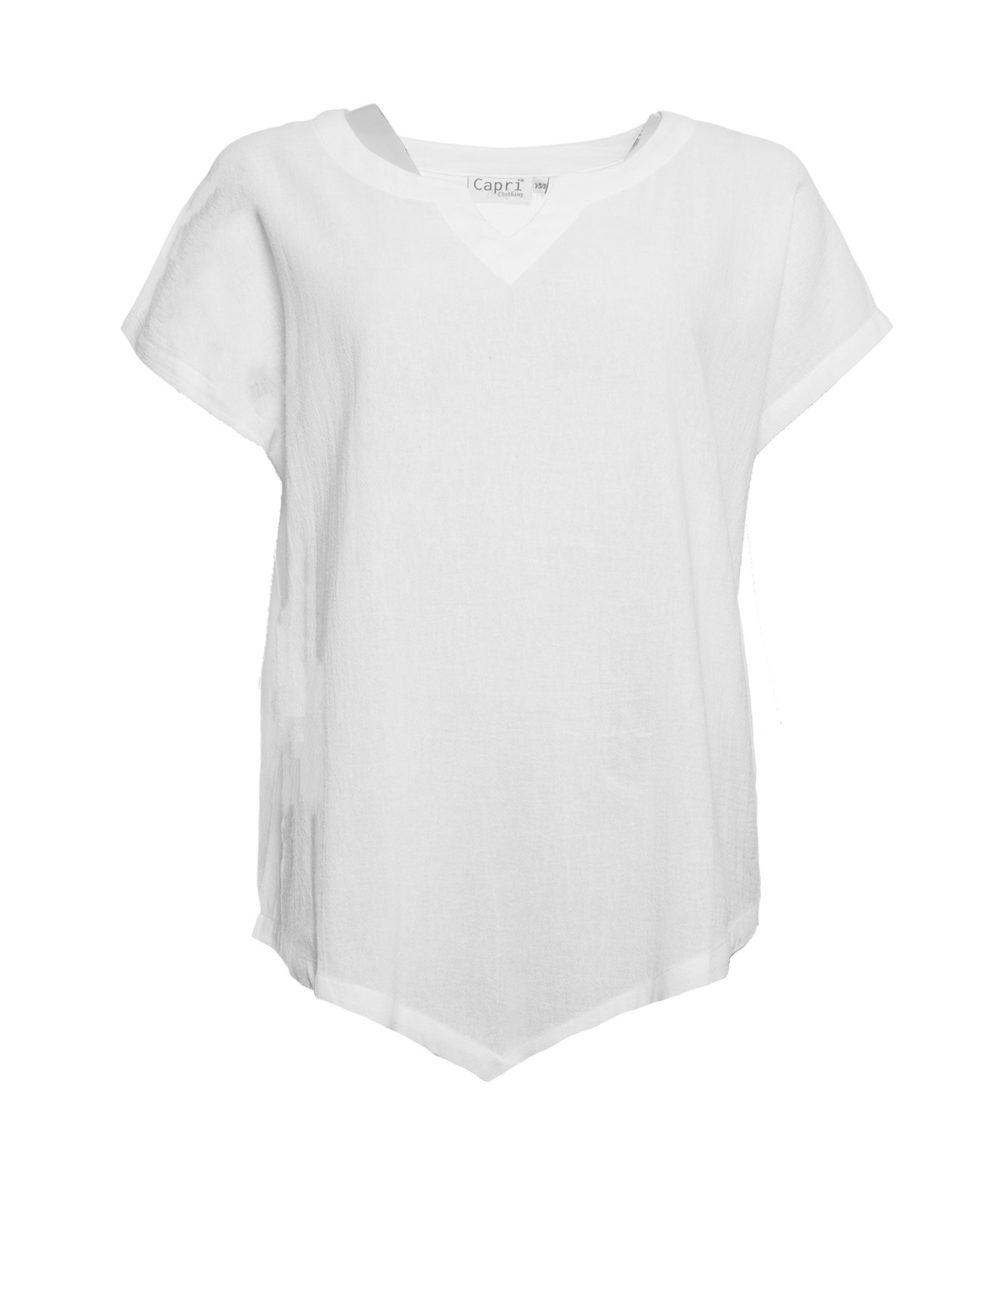 CSH-8016 Capri Katie Kerr Women's Clothing